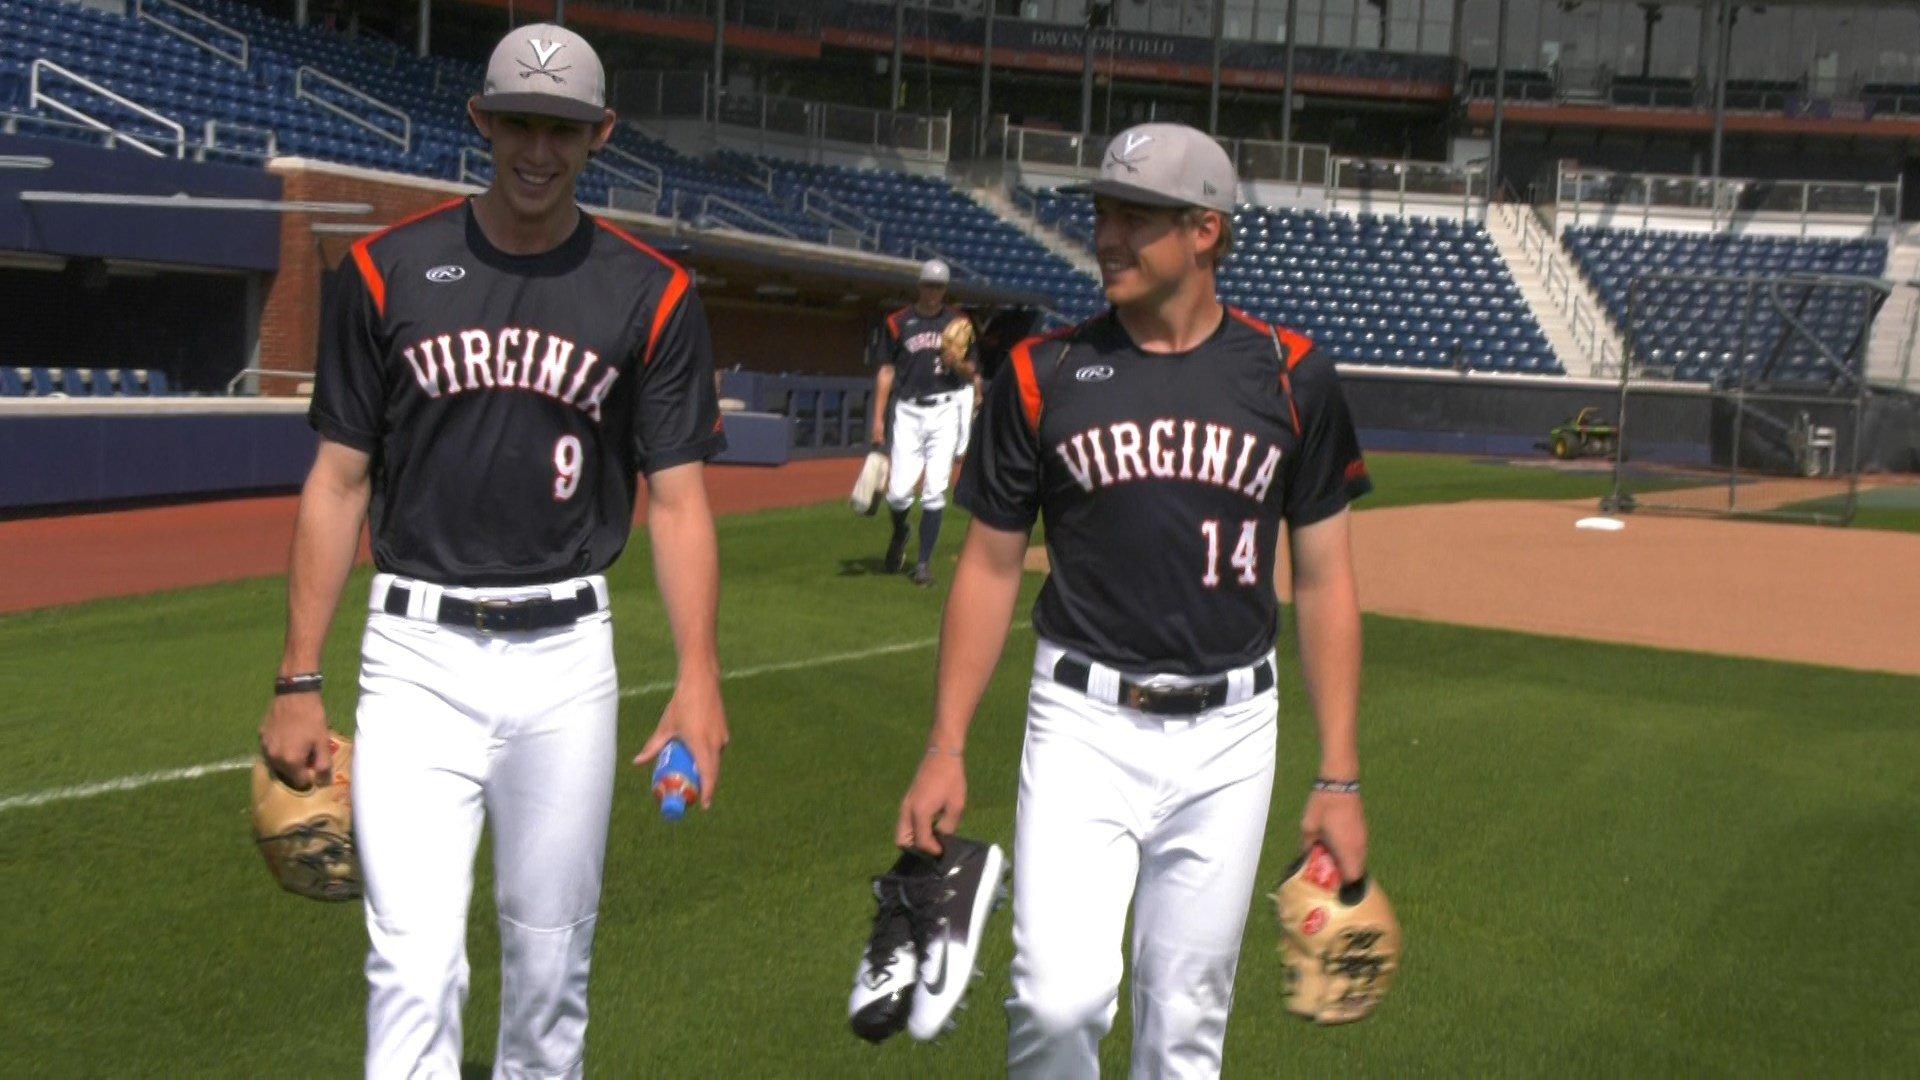 UVA pitchers Daniel Lynch and Derek Casey